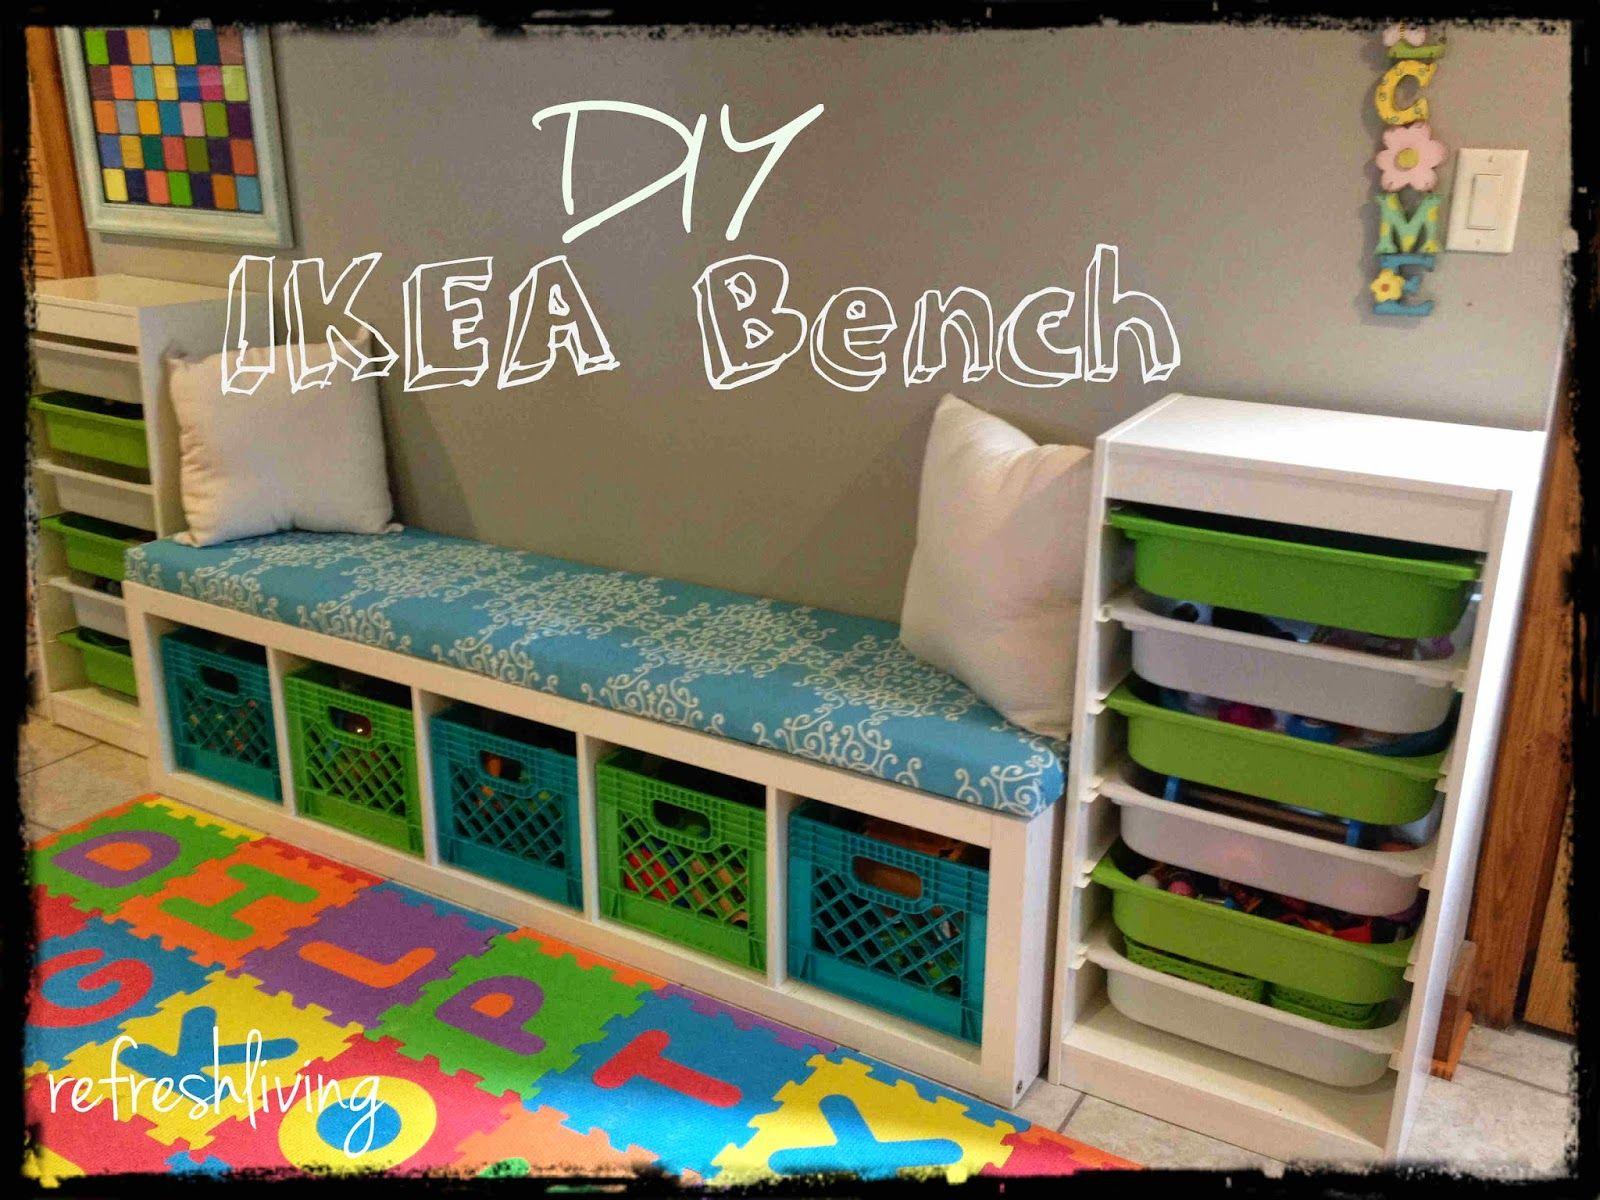 Refresh Living Diy Storage Bench With Ikea Shelf Diy Storage